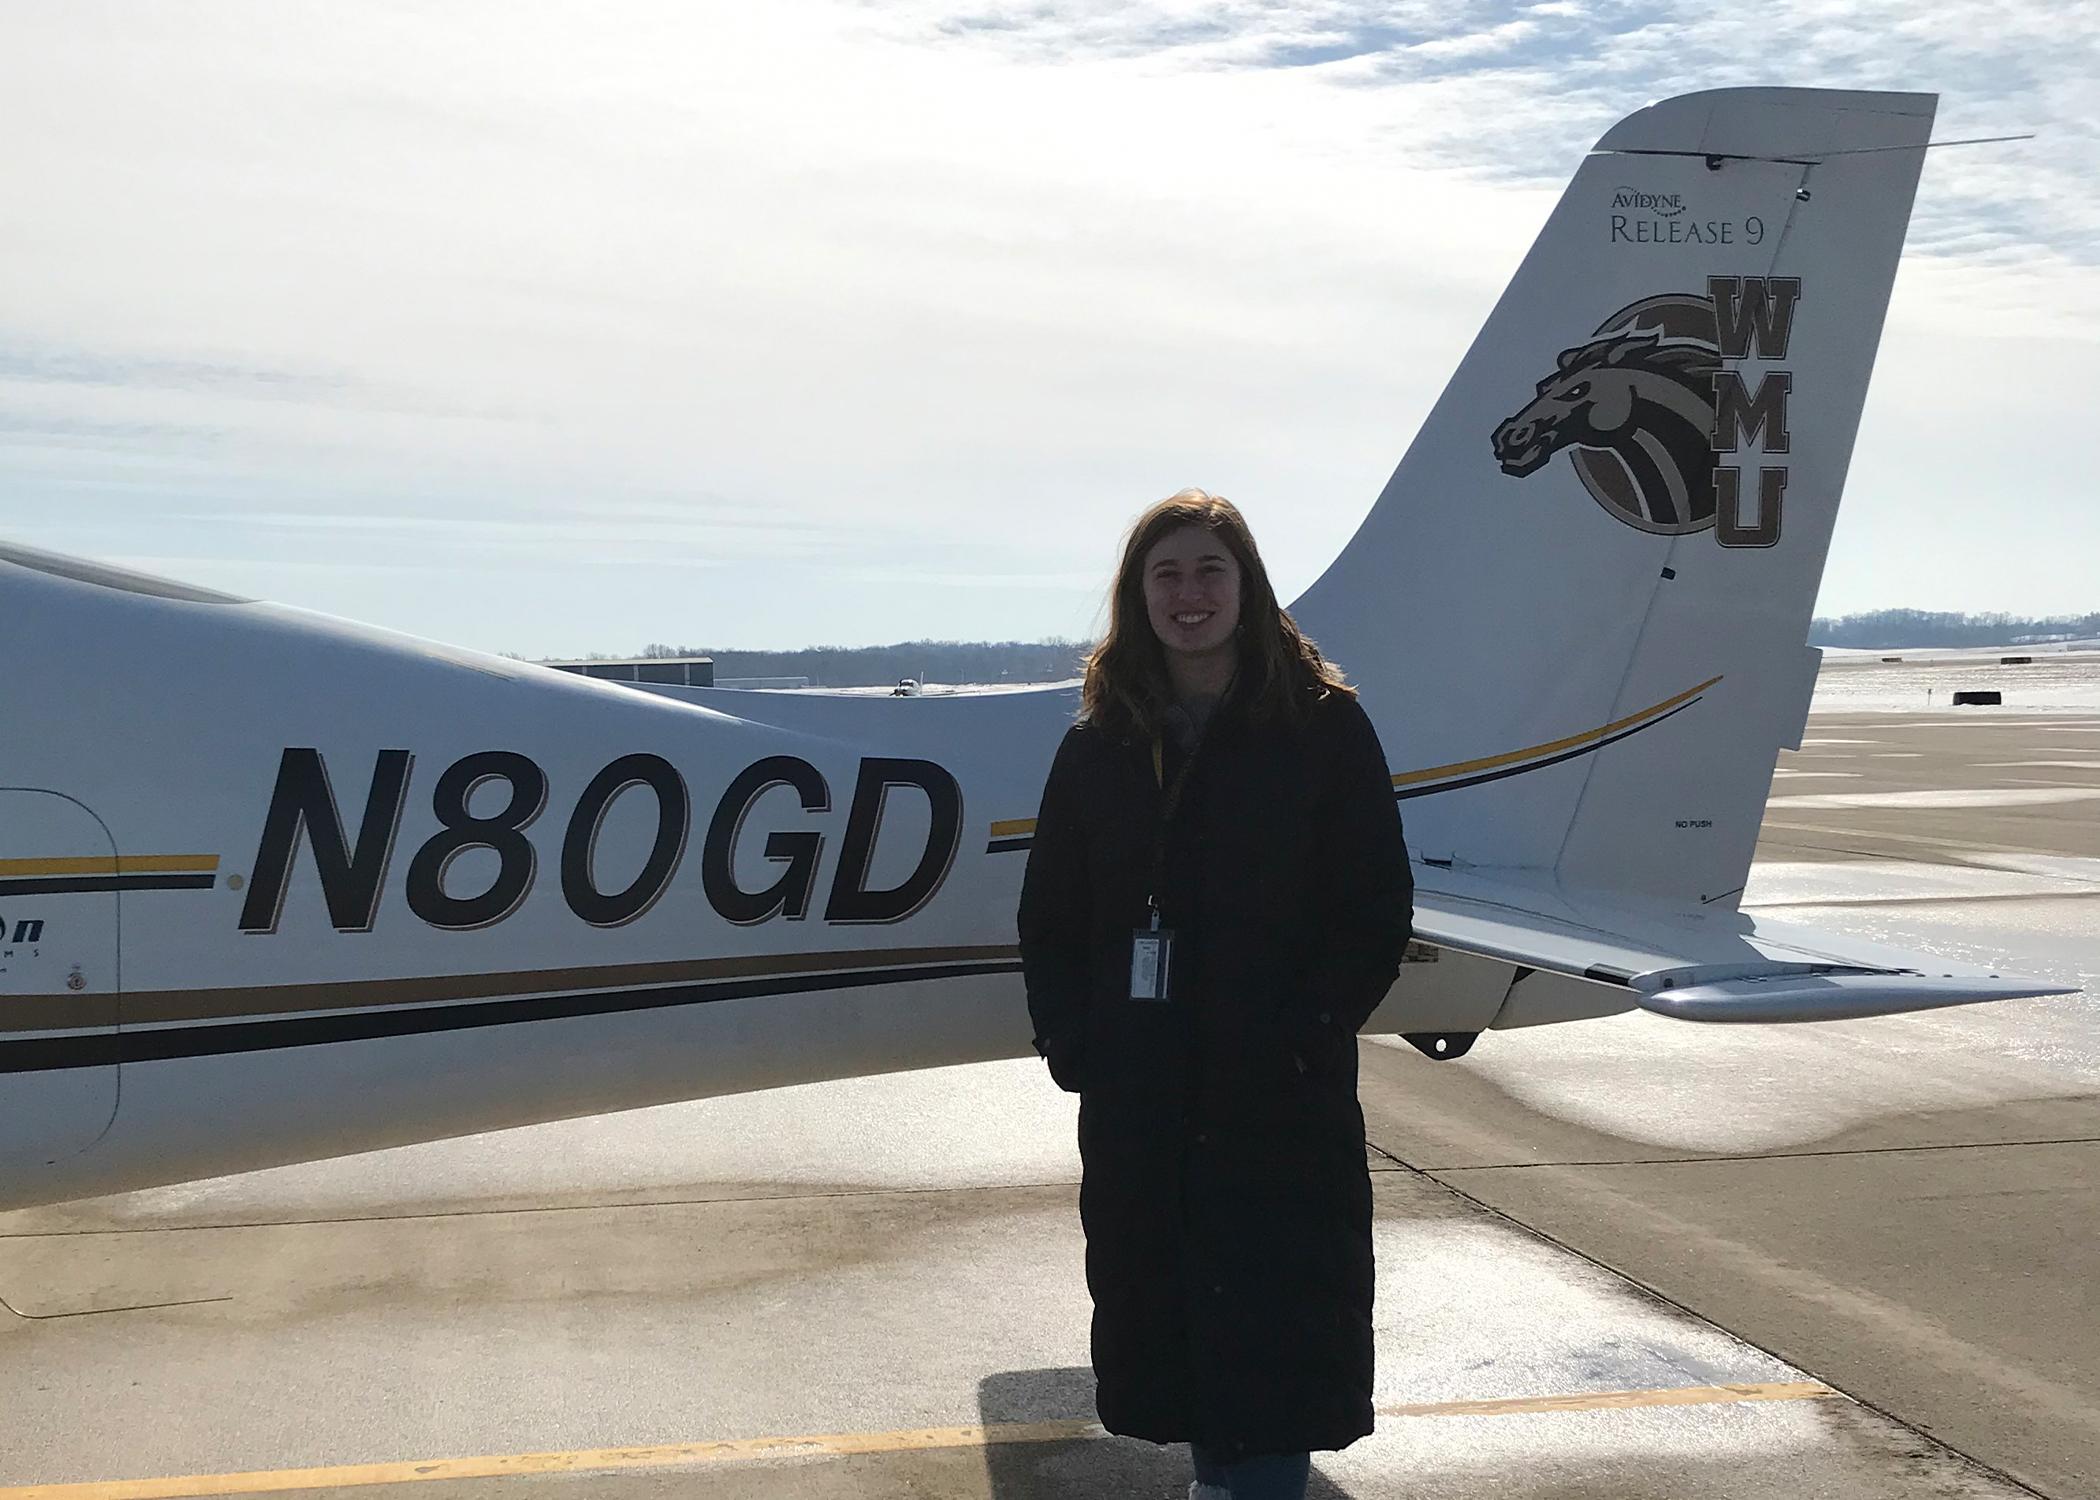 WMU Aviation Flight Science Student Emma Anderson